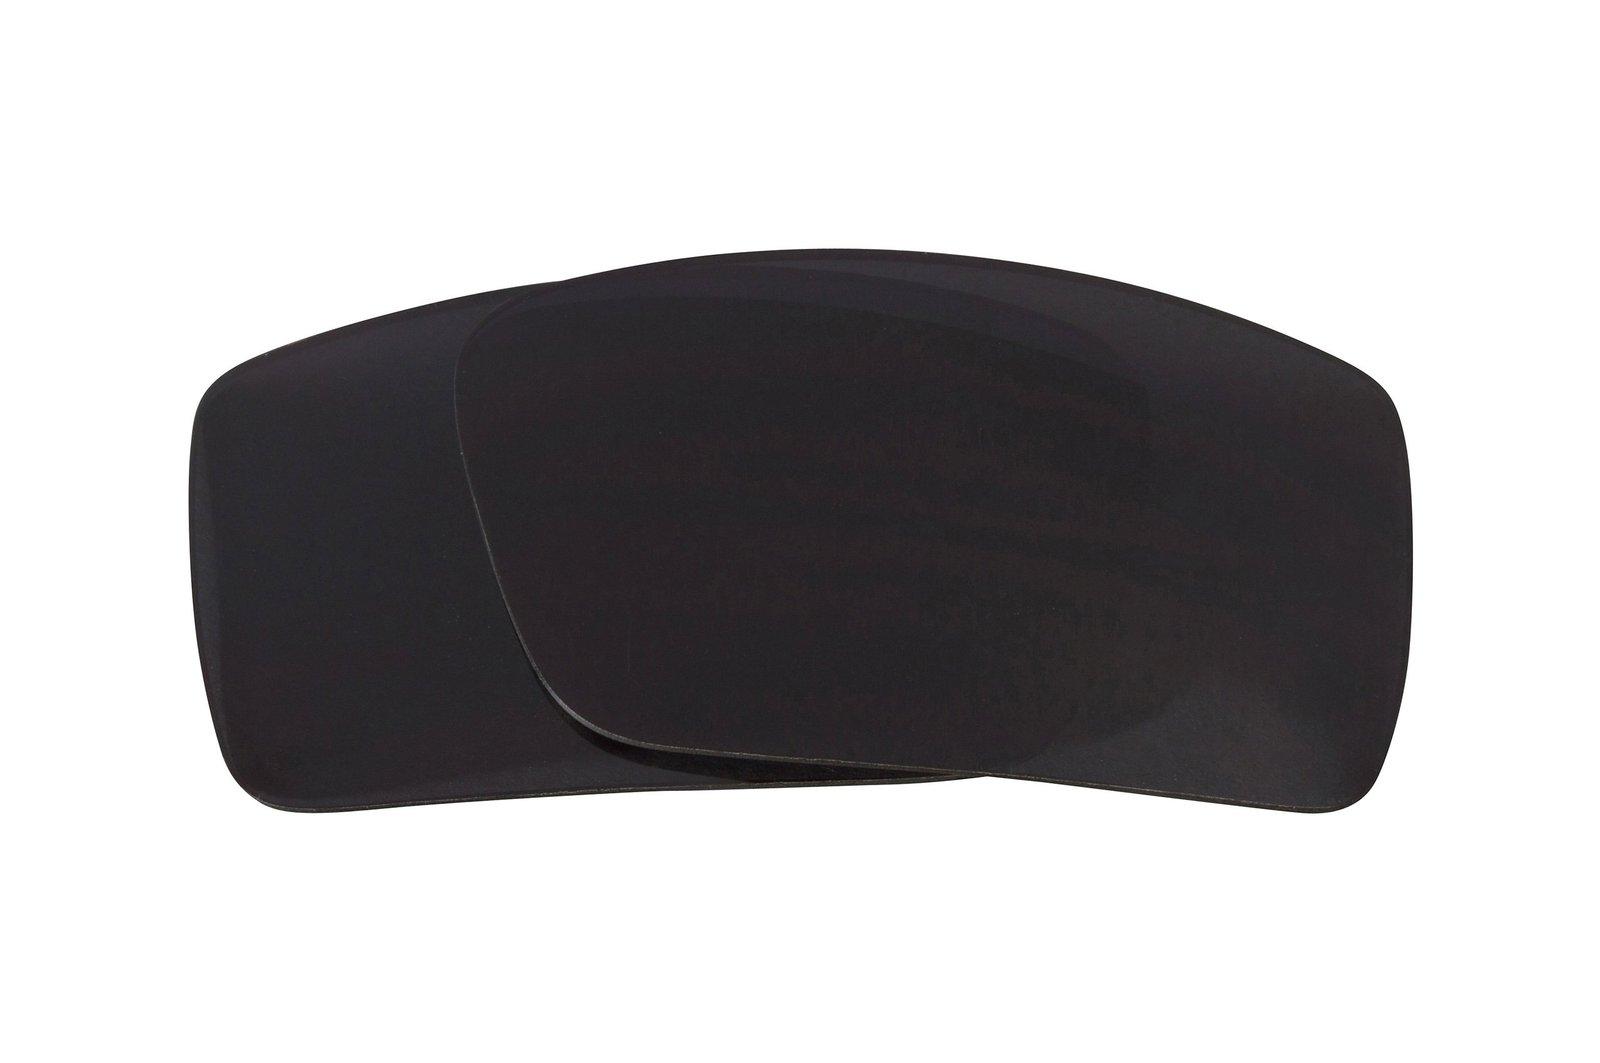 New SEEK OPTICS Replacement Lenses Oakley THUMP 2 - Polarized Grey image 2